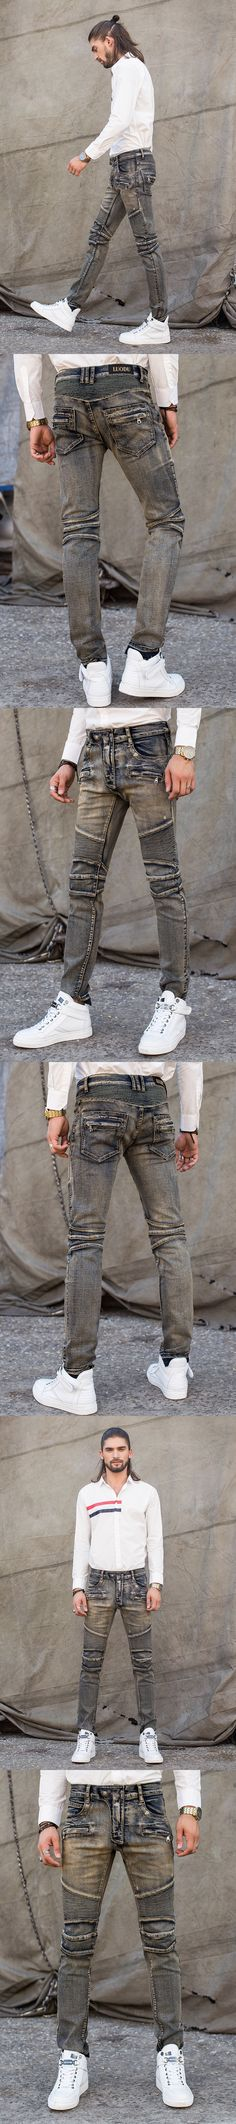 Free Shipping High Quality Mens Jeans Fashion Zipper Pocket Biker Jeans Hip Hop Skinny Jeans Men Large Size Mens Pants